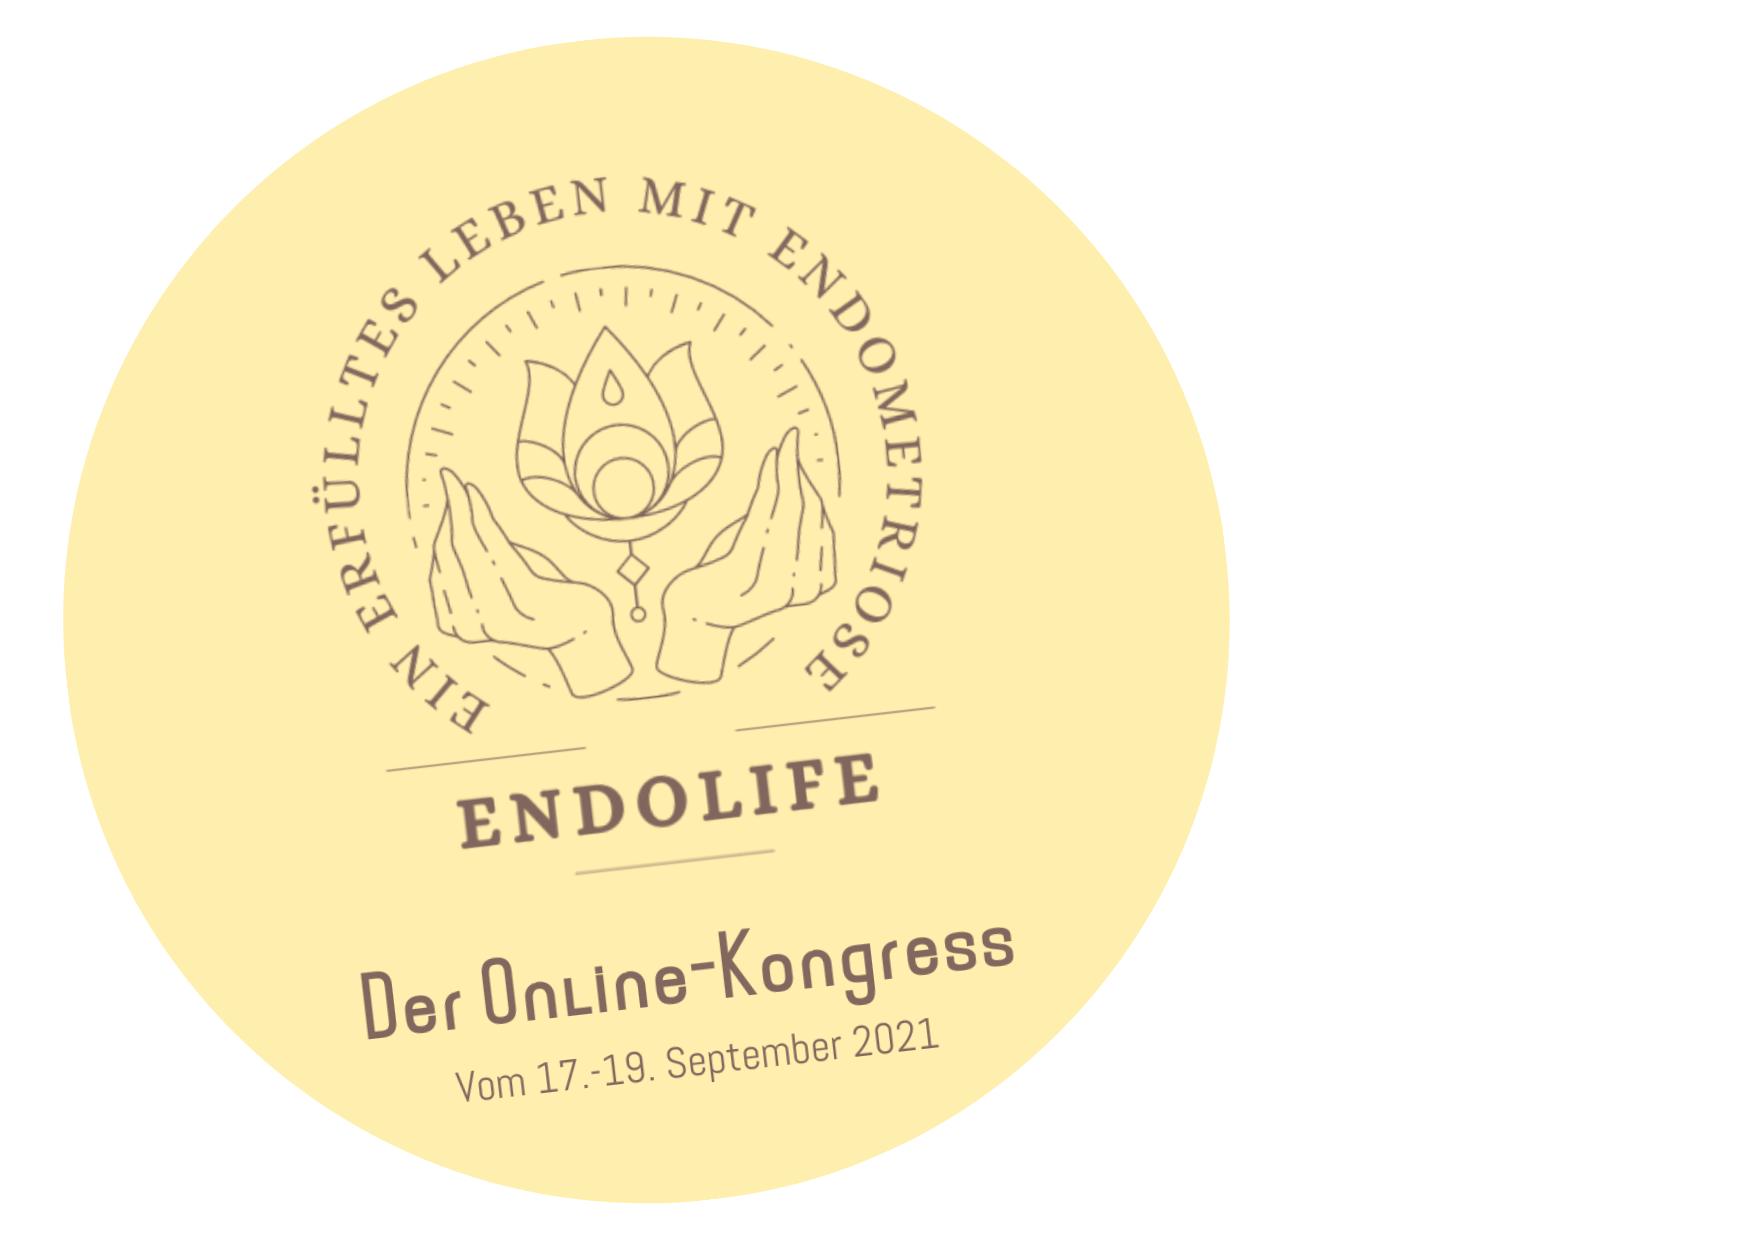 ENDOLIFE Online Kongress Eva Sturm Rita Hofmeister STUDIO ICH Impuls-Strömen Endometriose